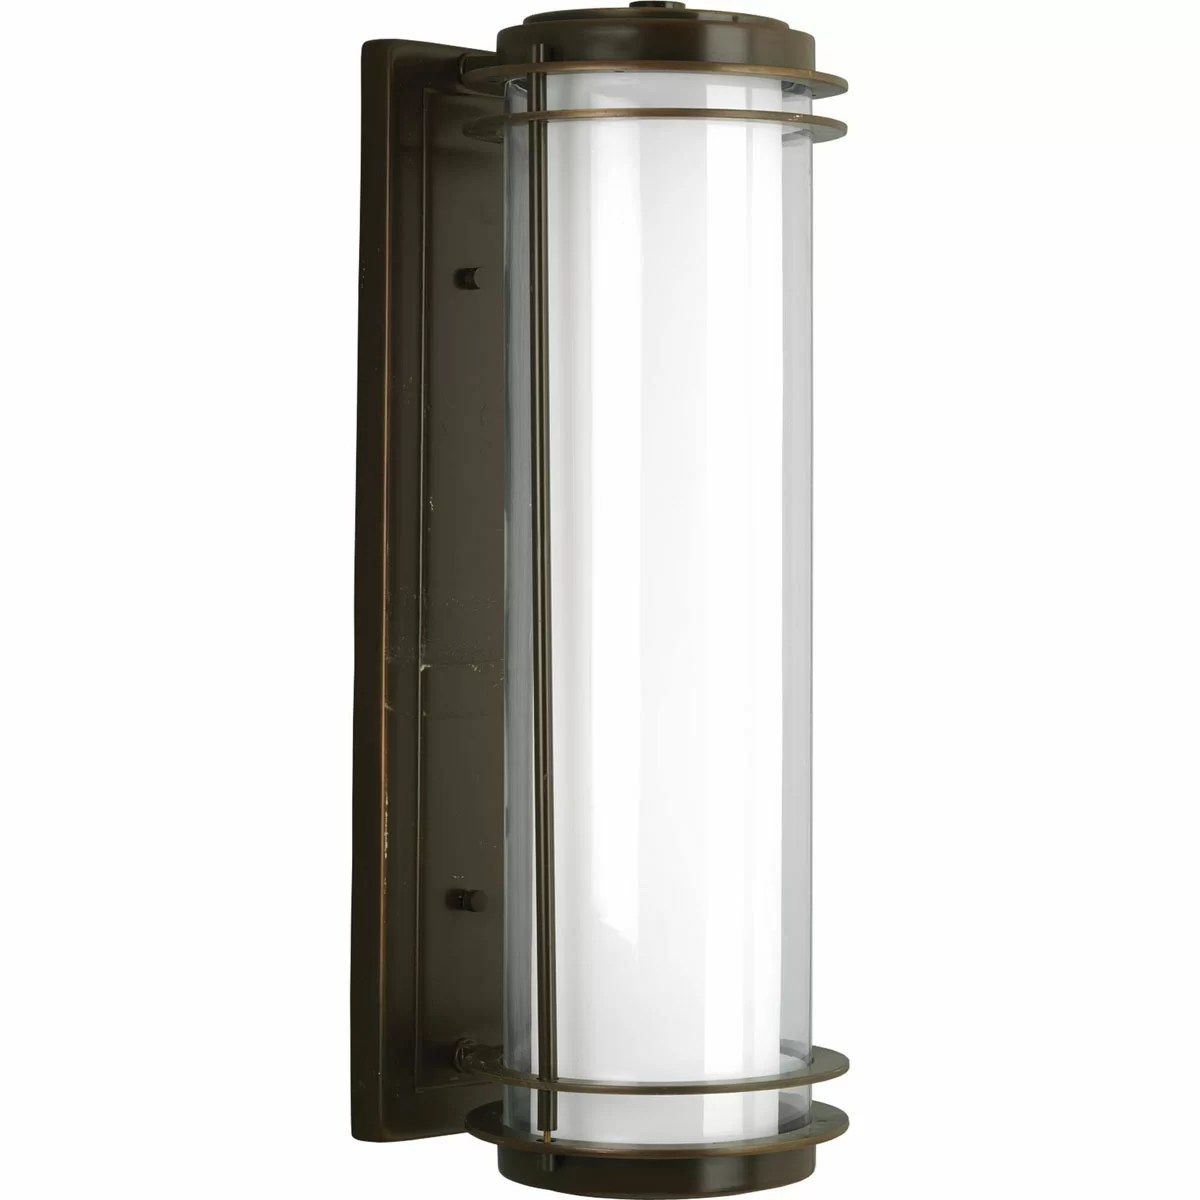 Penfield 2 Light Sconce   Wayfair on Wayfair Bathroom Sconces id=44200